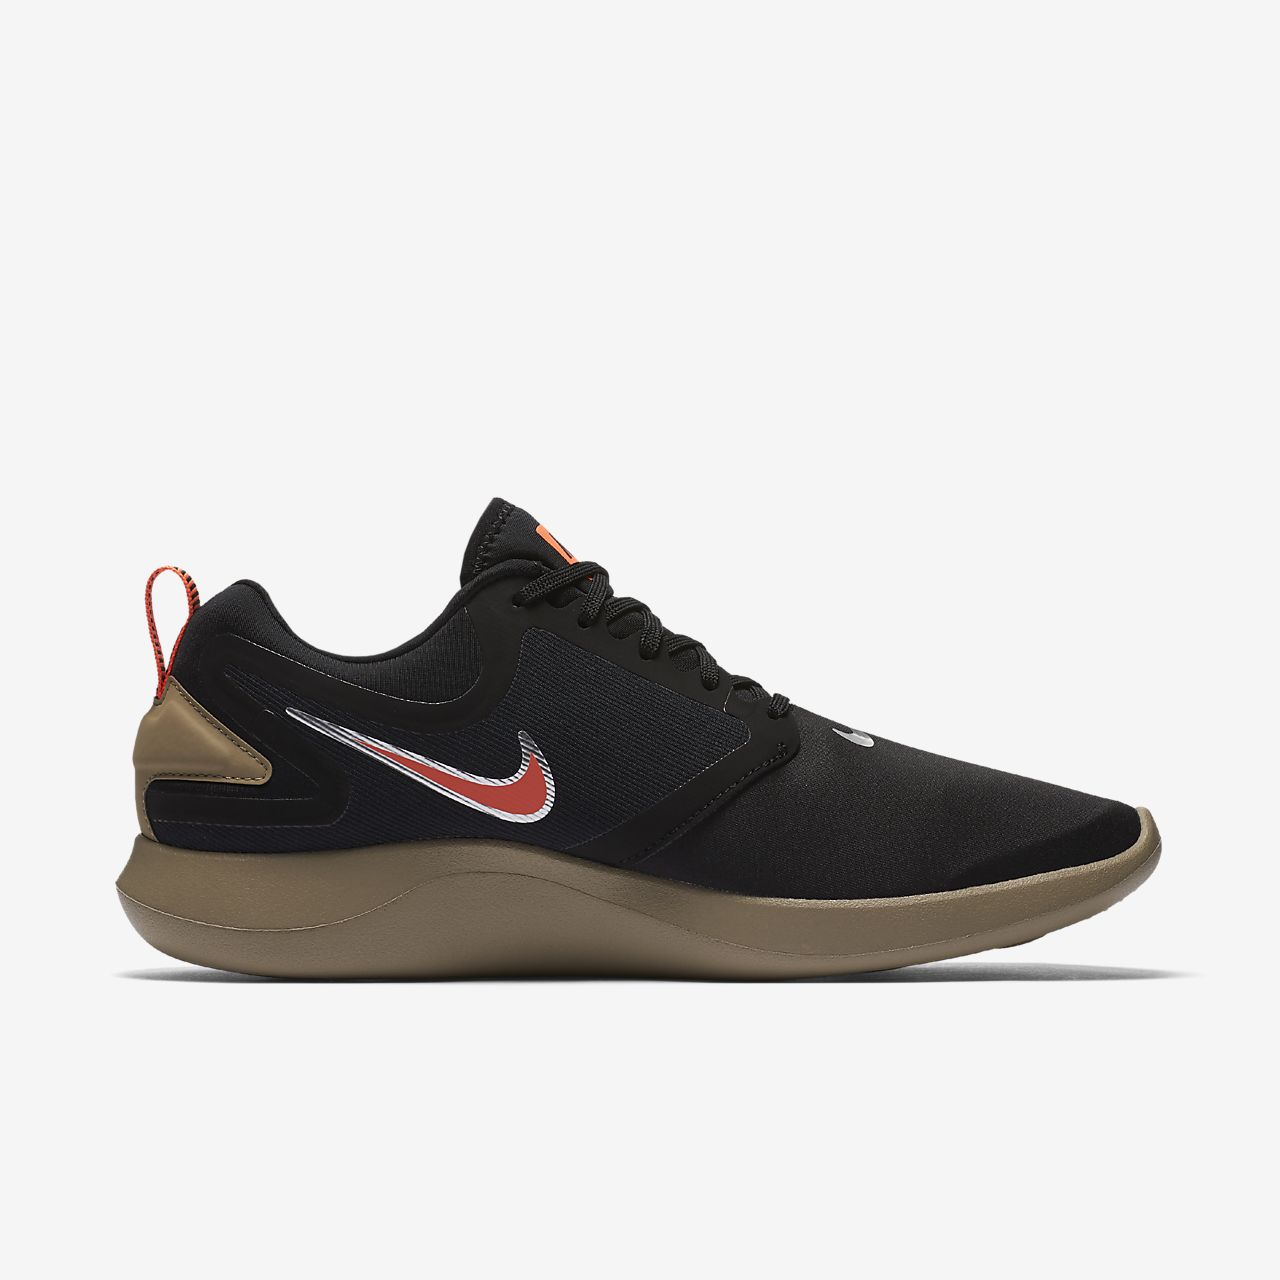 Low Resolution Nike LunarSolo Men's Running Shoe Nike LunarSolo Men's  Running Shoe